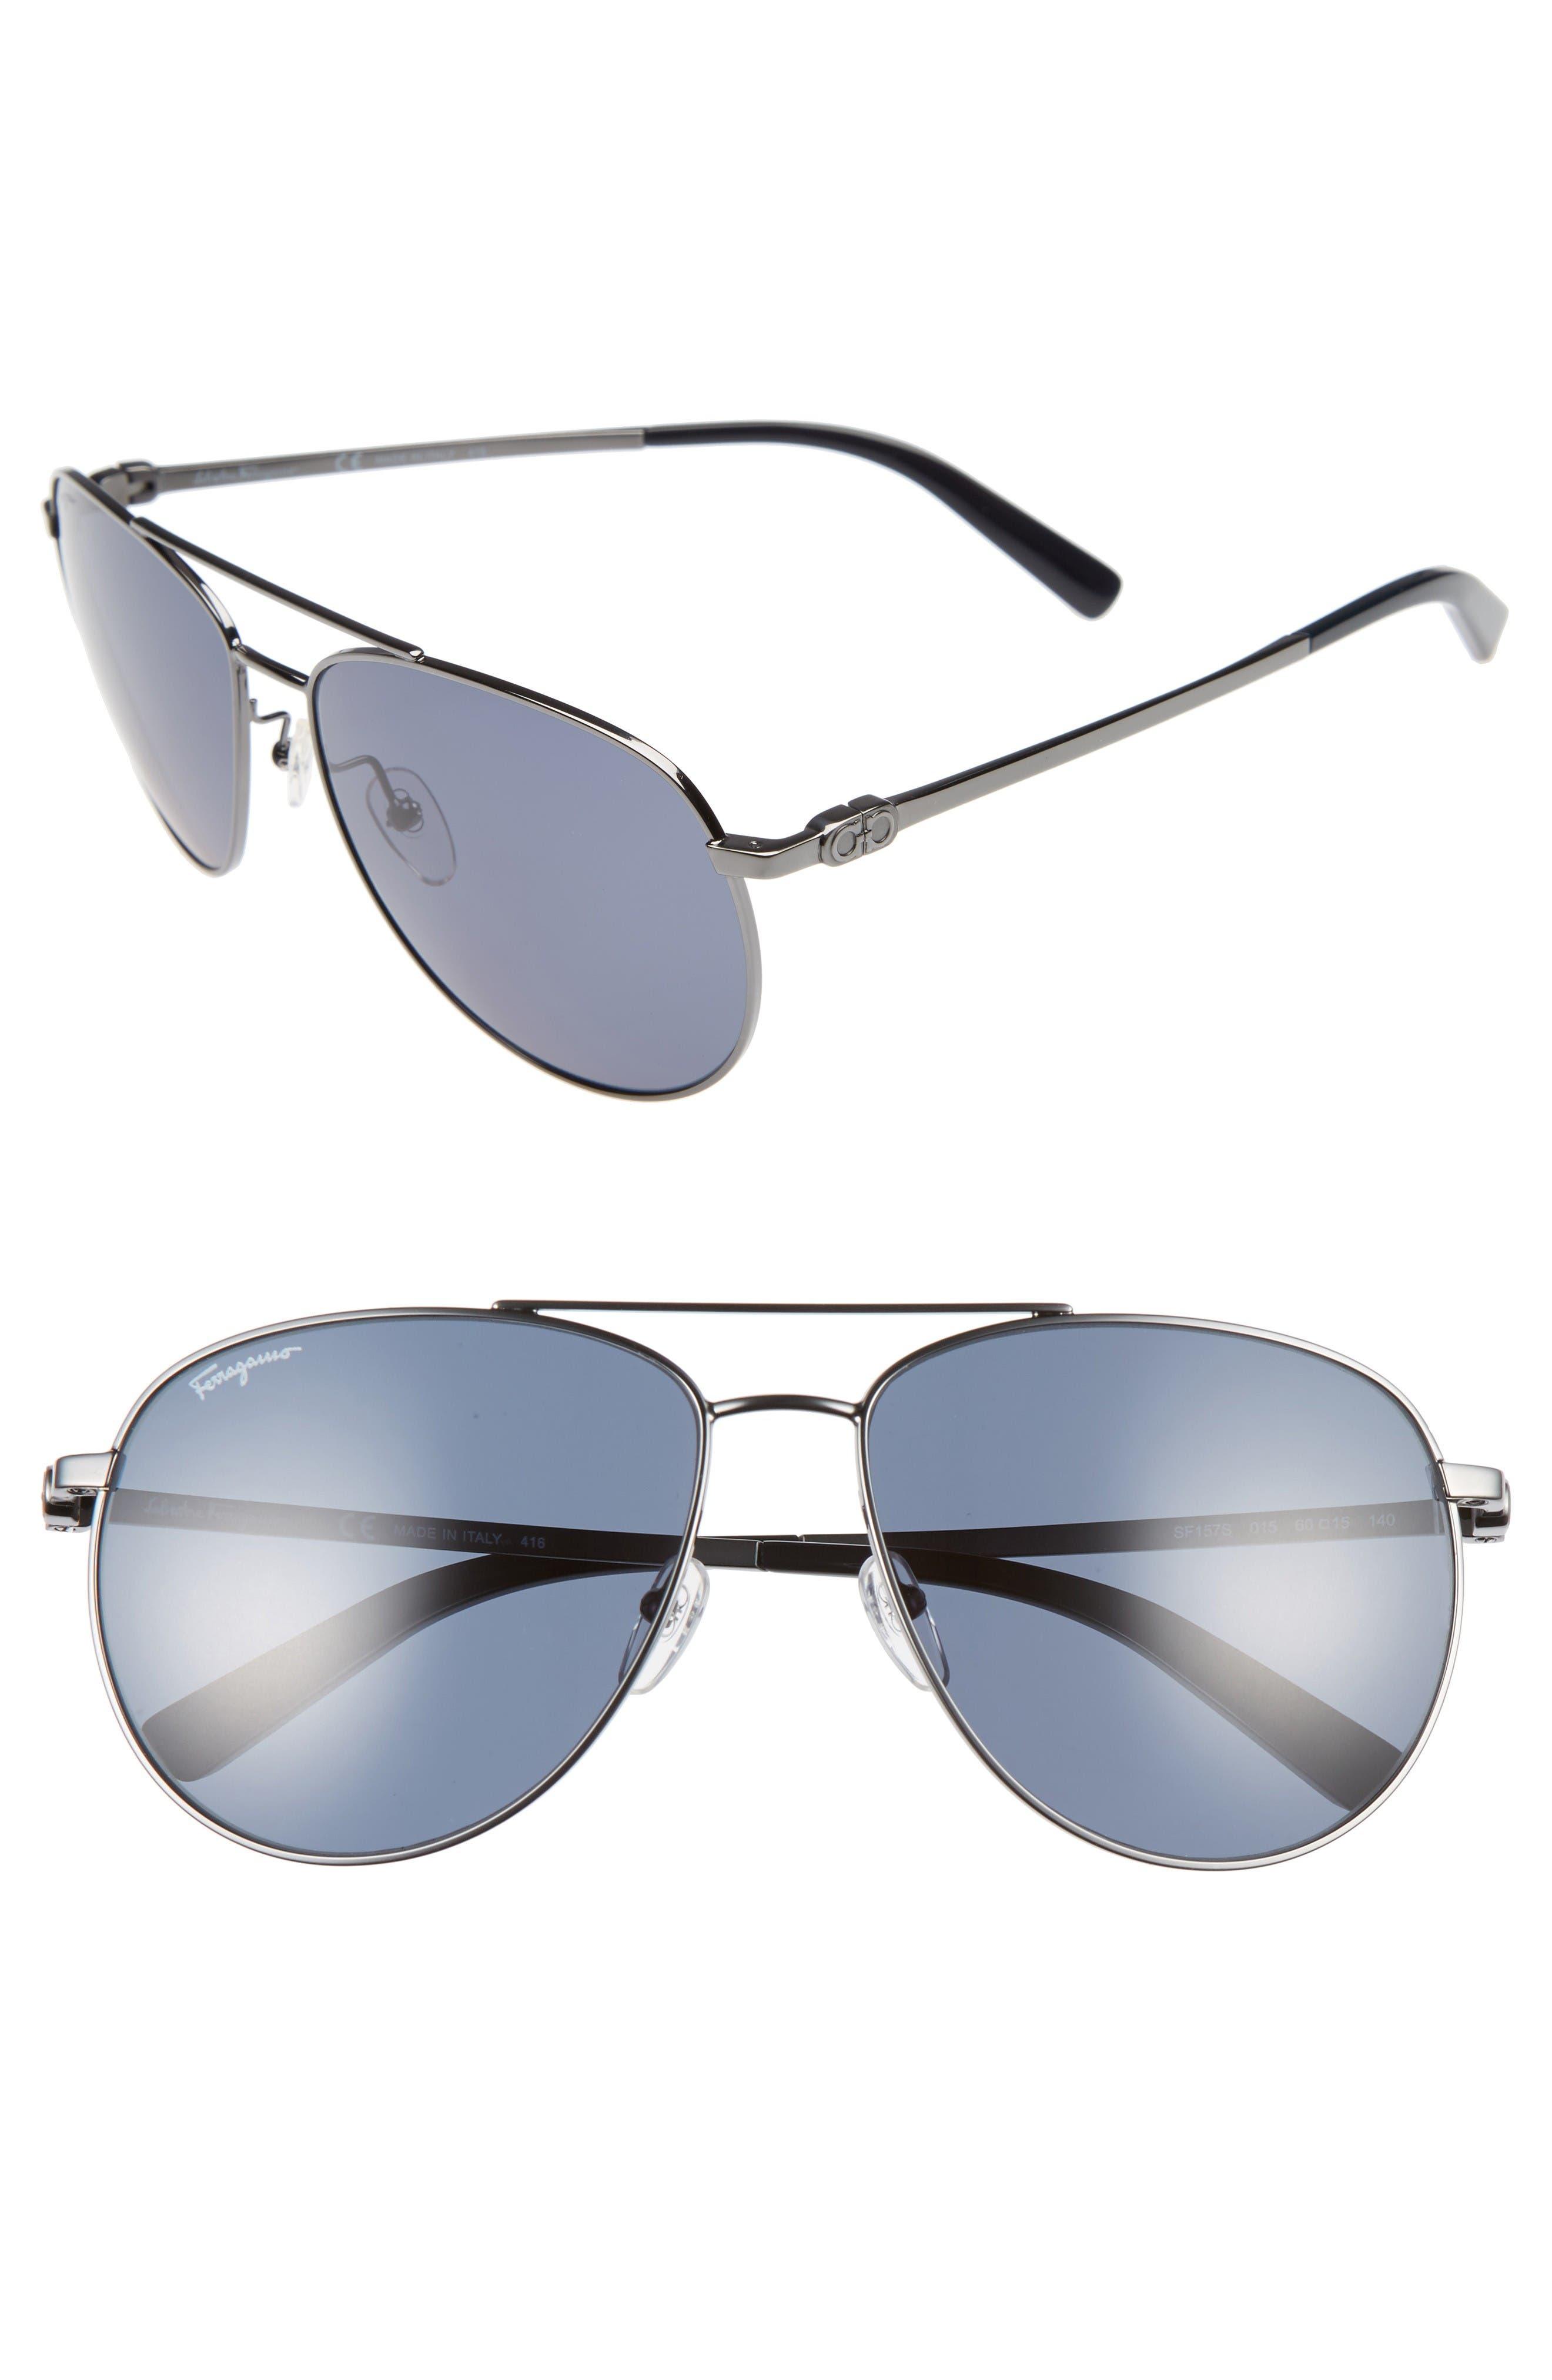 Alternate Image 1 Selected - Salvatore Ferragamo Gancio 60mm Aviator Sunglasses